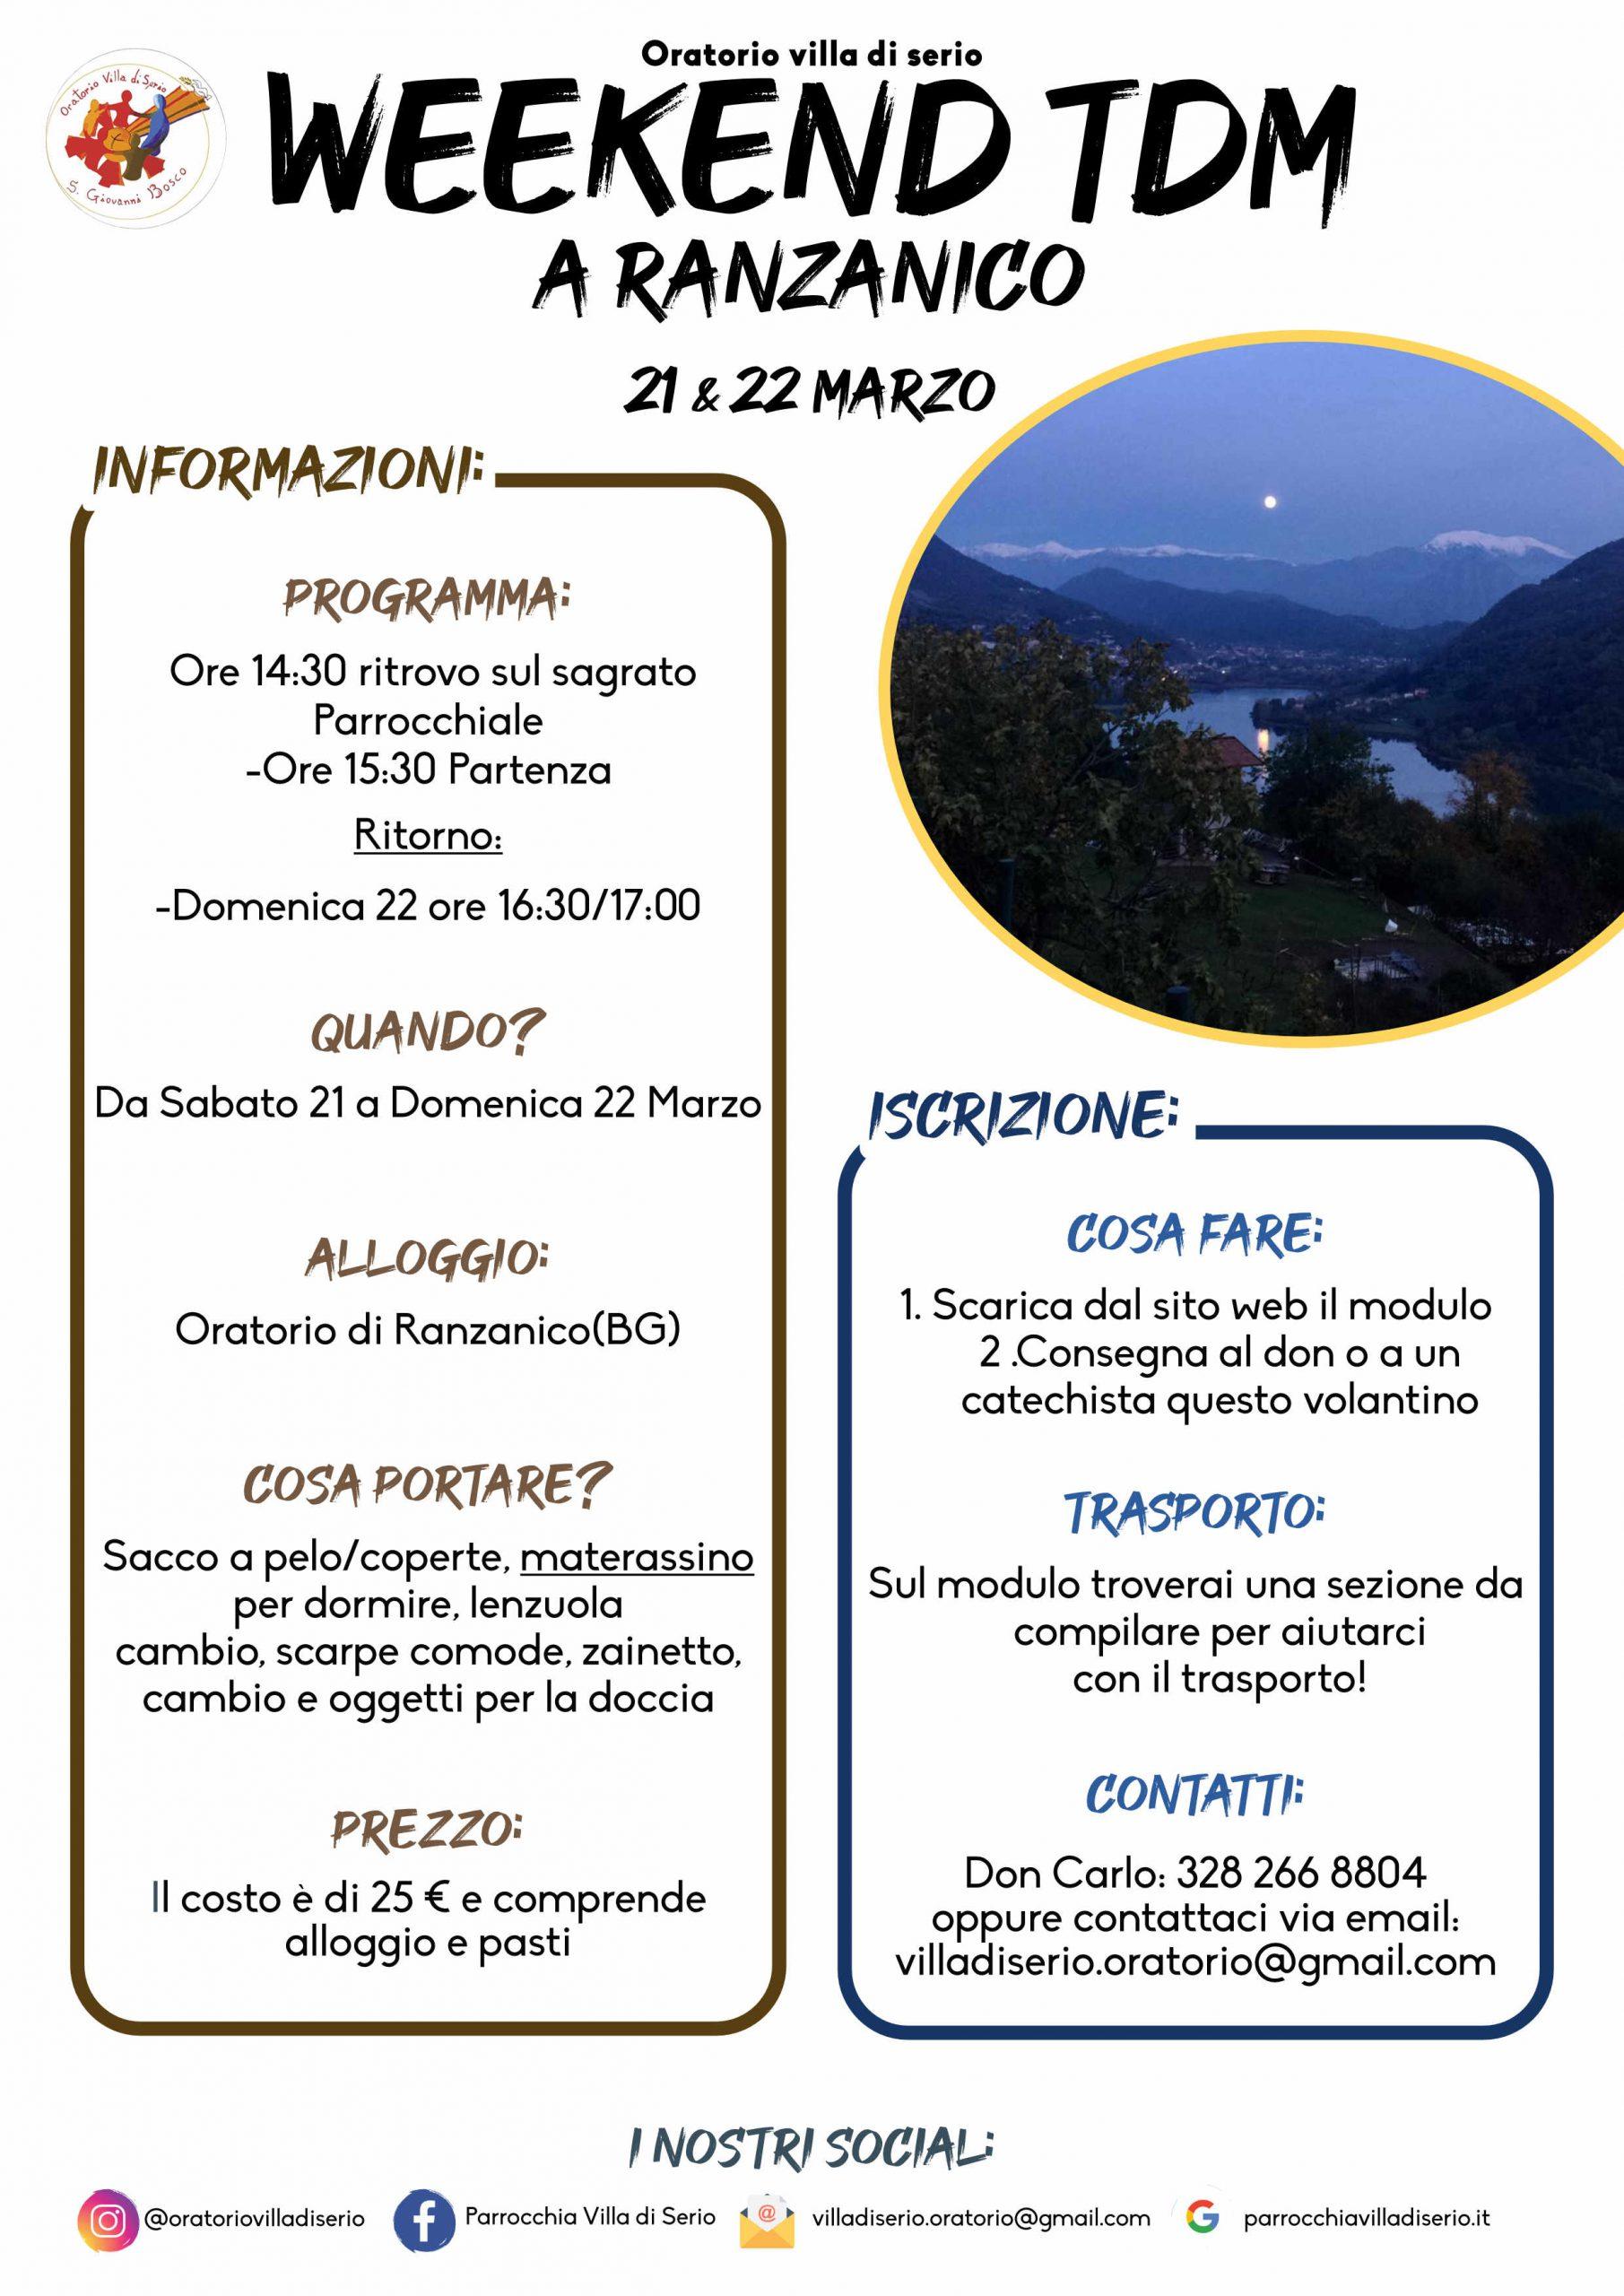 Weekend TDM Ranzanico 2020